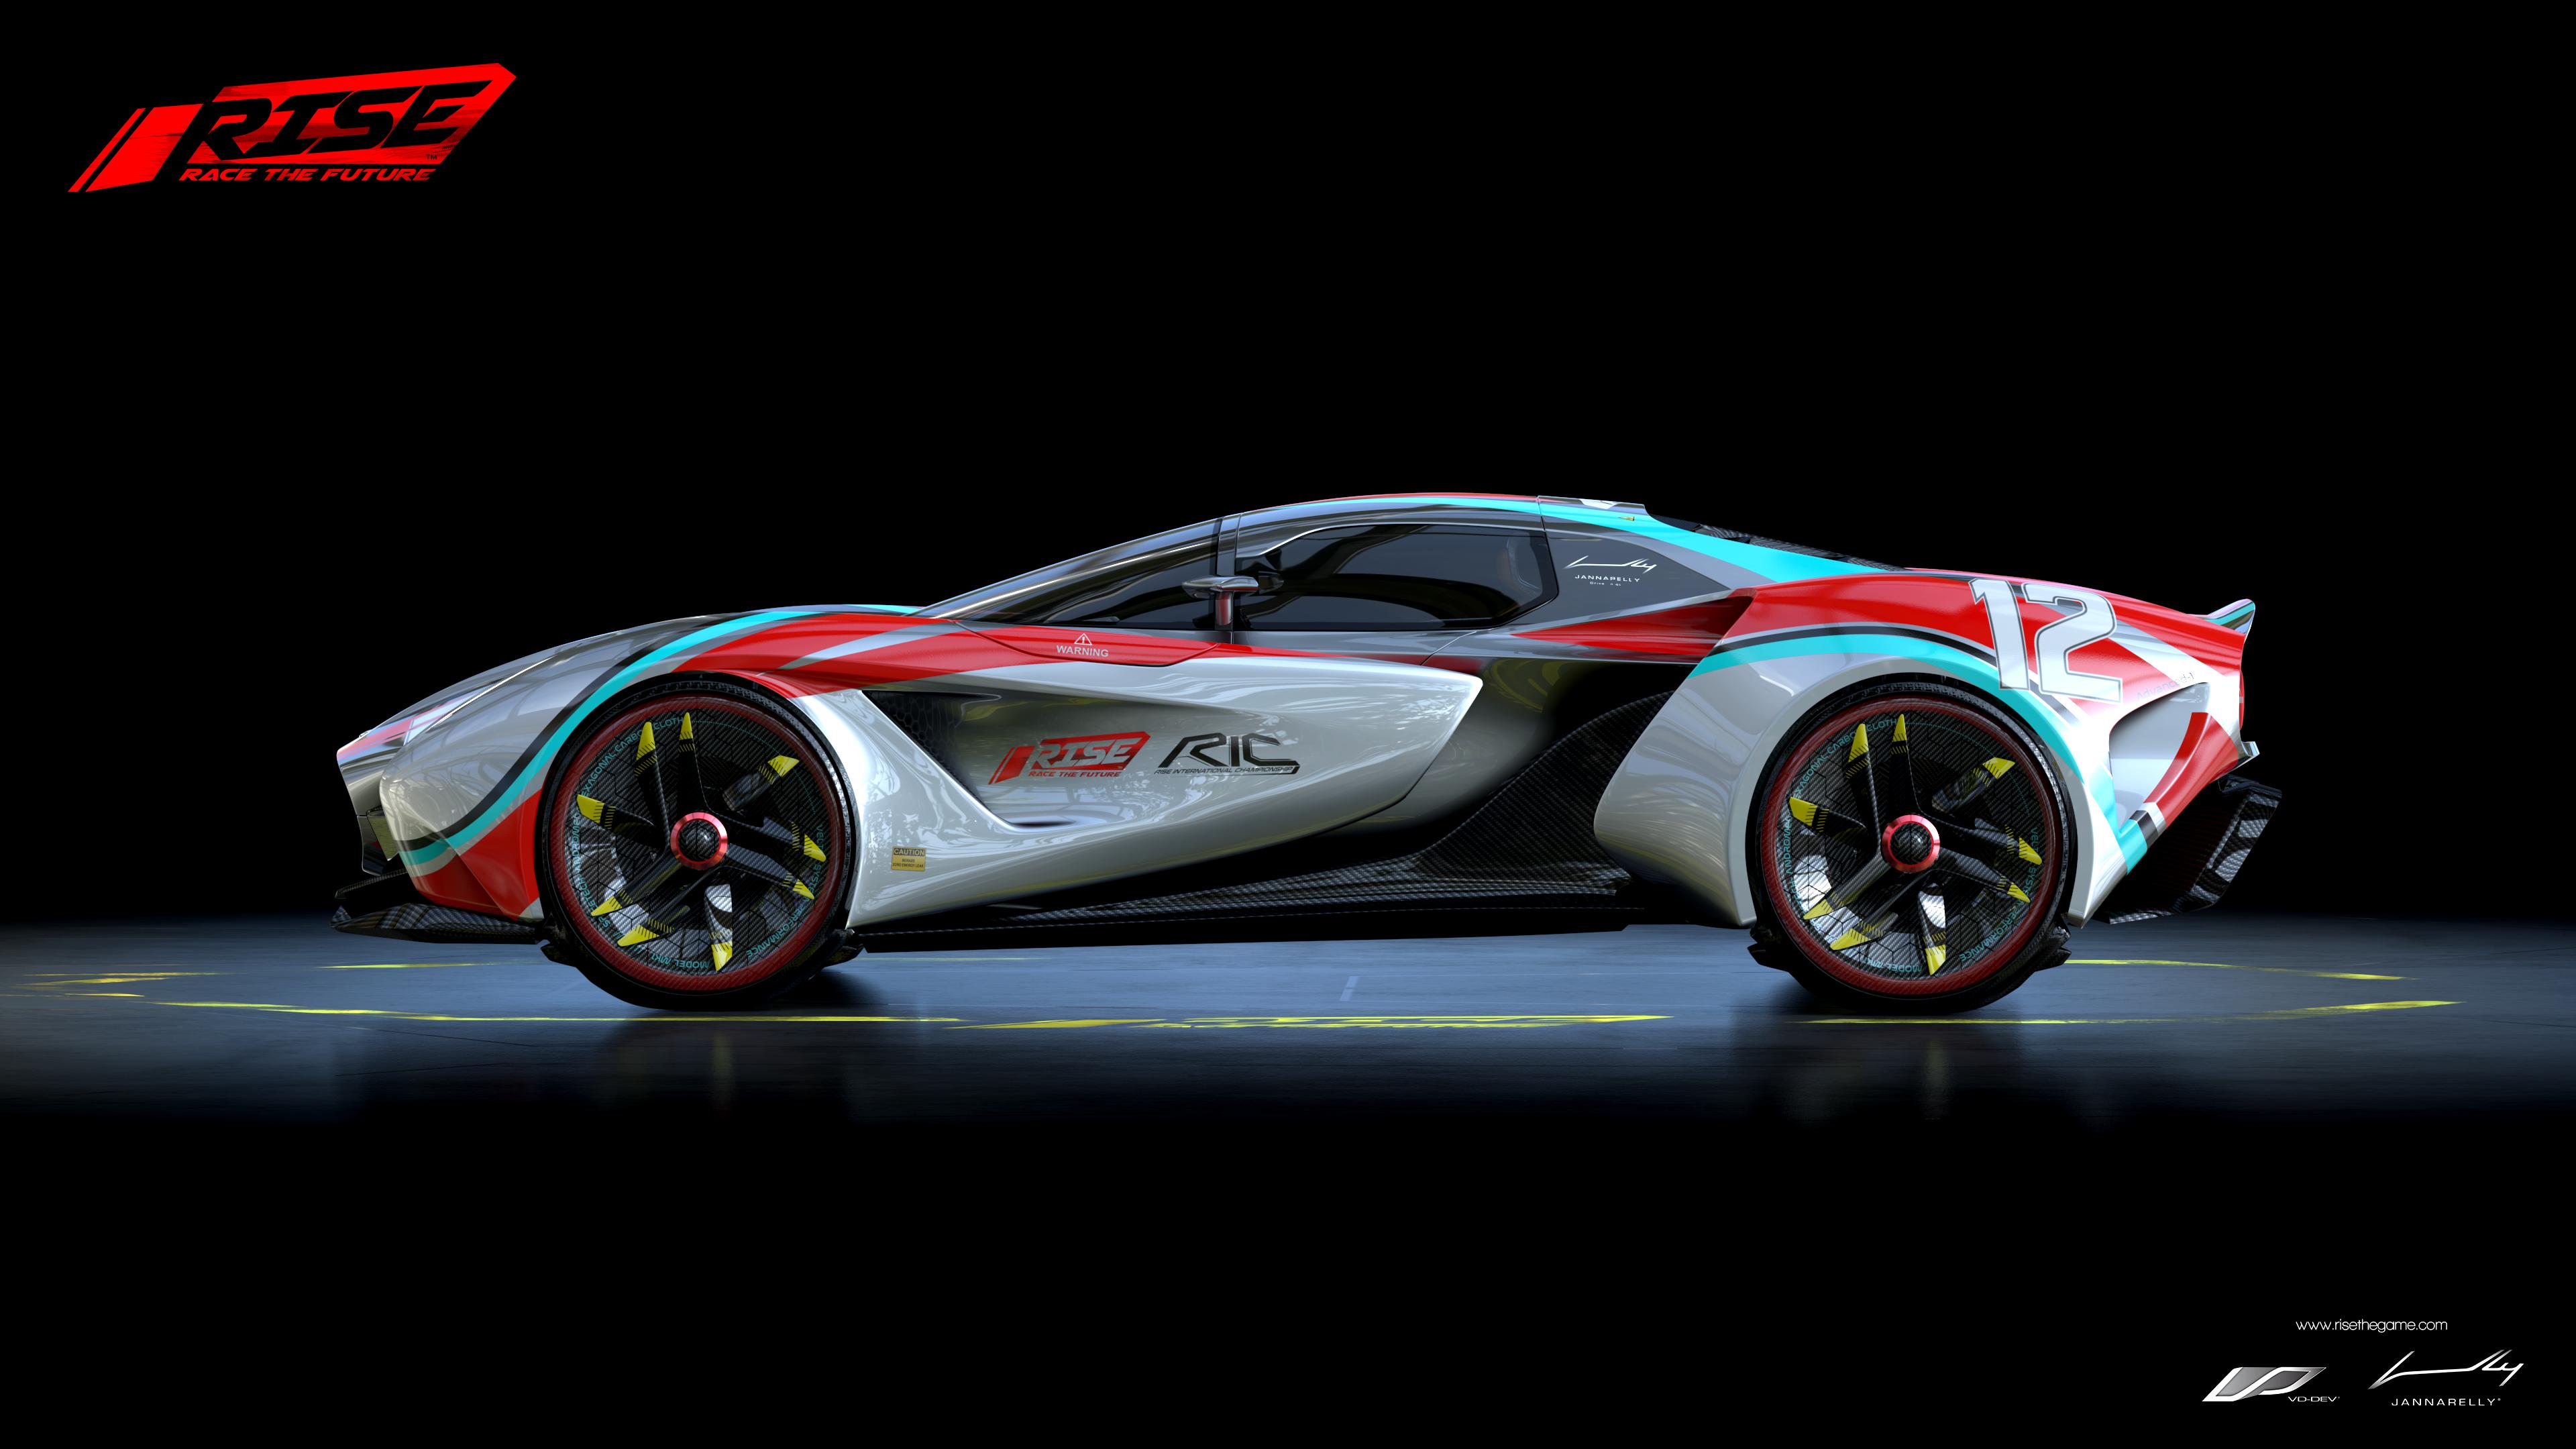 Racing Car Games Hd Wallpaper: Rise Race The Future Racing Game, HD Games, 4k Wallpapers